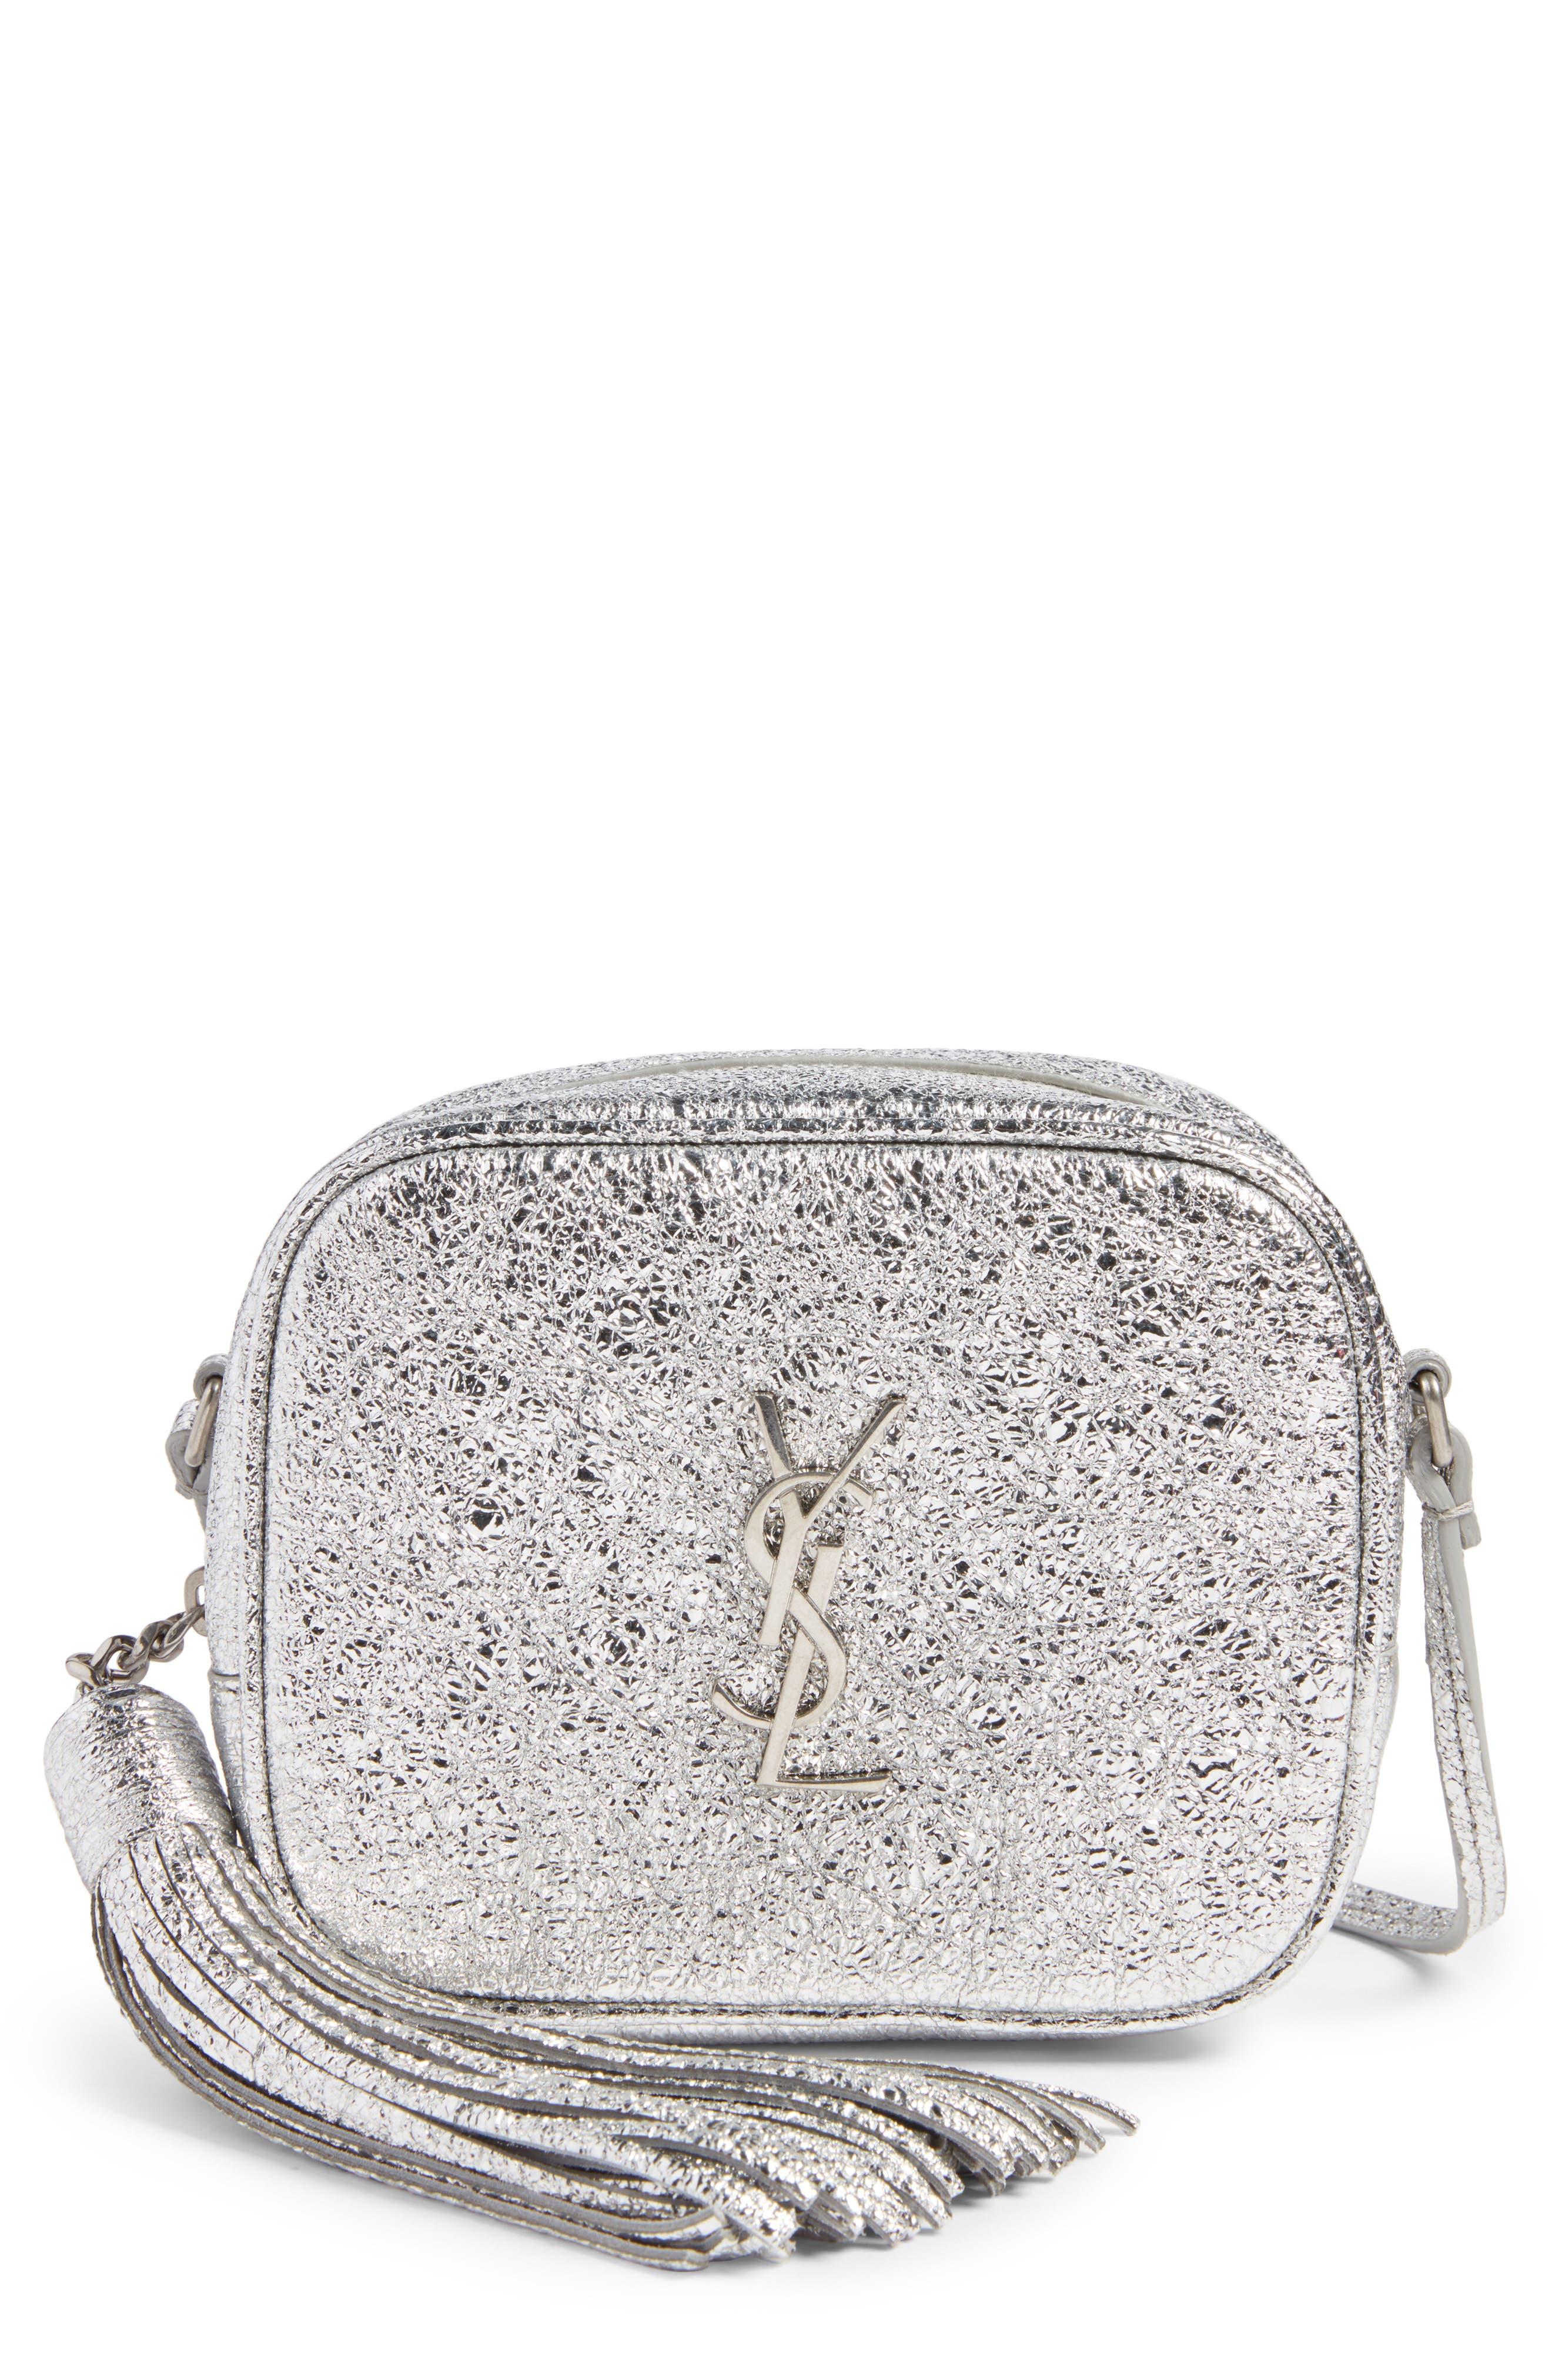 Alternate Image 1 Selected - Saint Laurent Monogram Blogger Calfskin Crossbody Bag